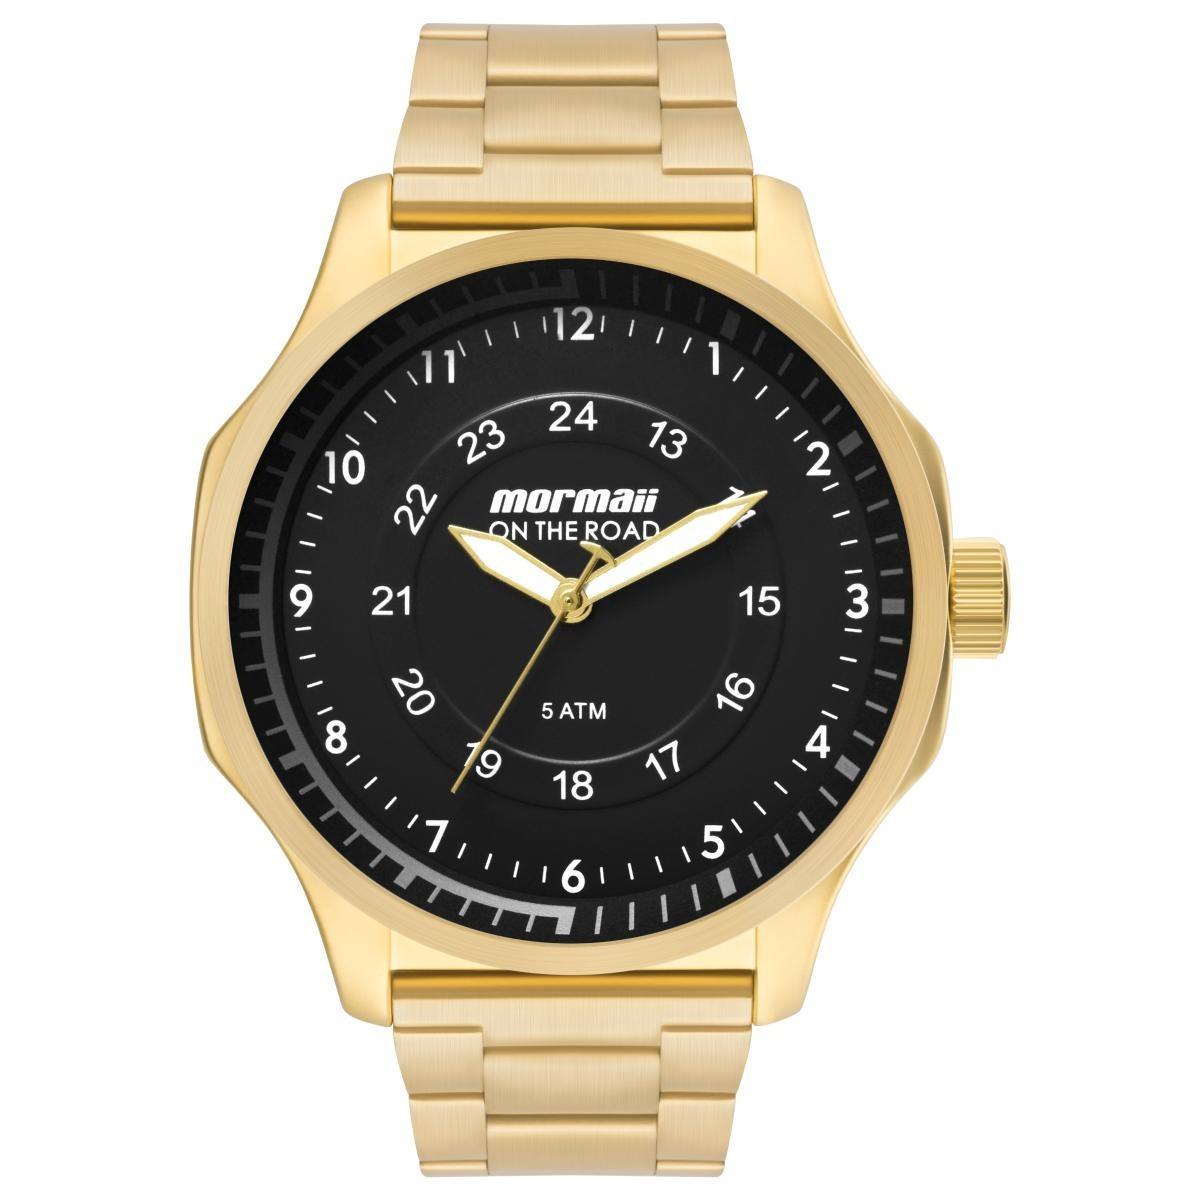 b1e9910c5bd4c Relógio Masculino Mormaii Mo2035gz 4d Pulseira Aço Dourada - R  204 ...